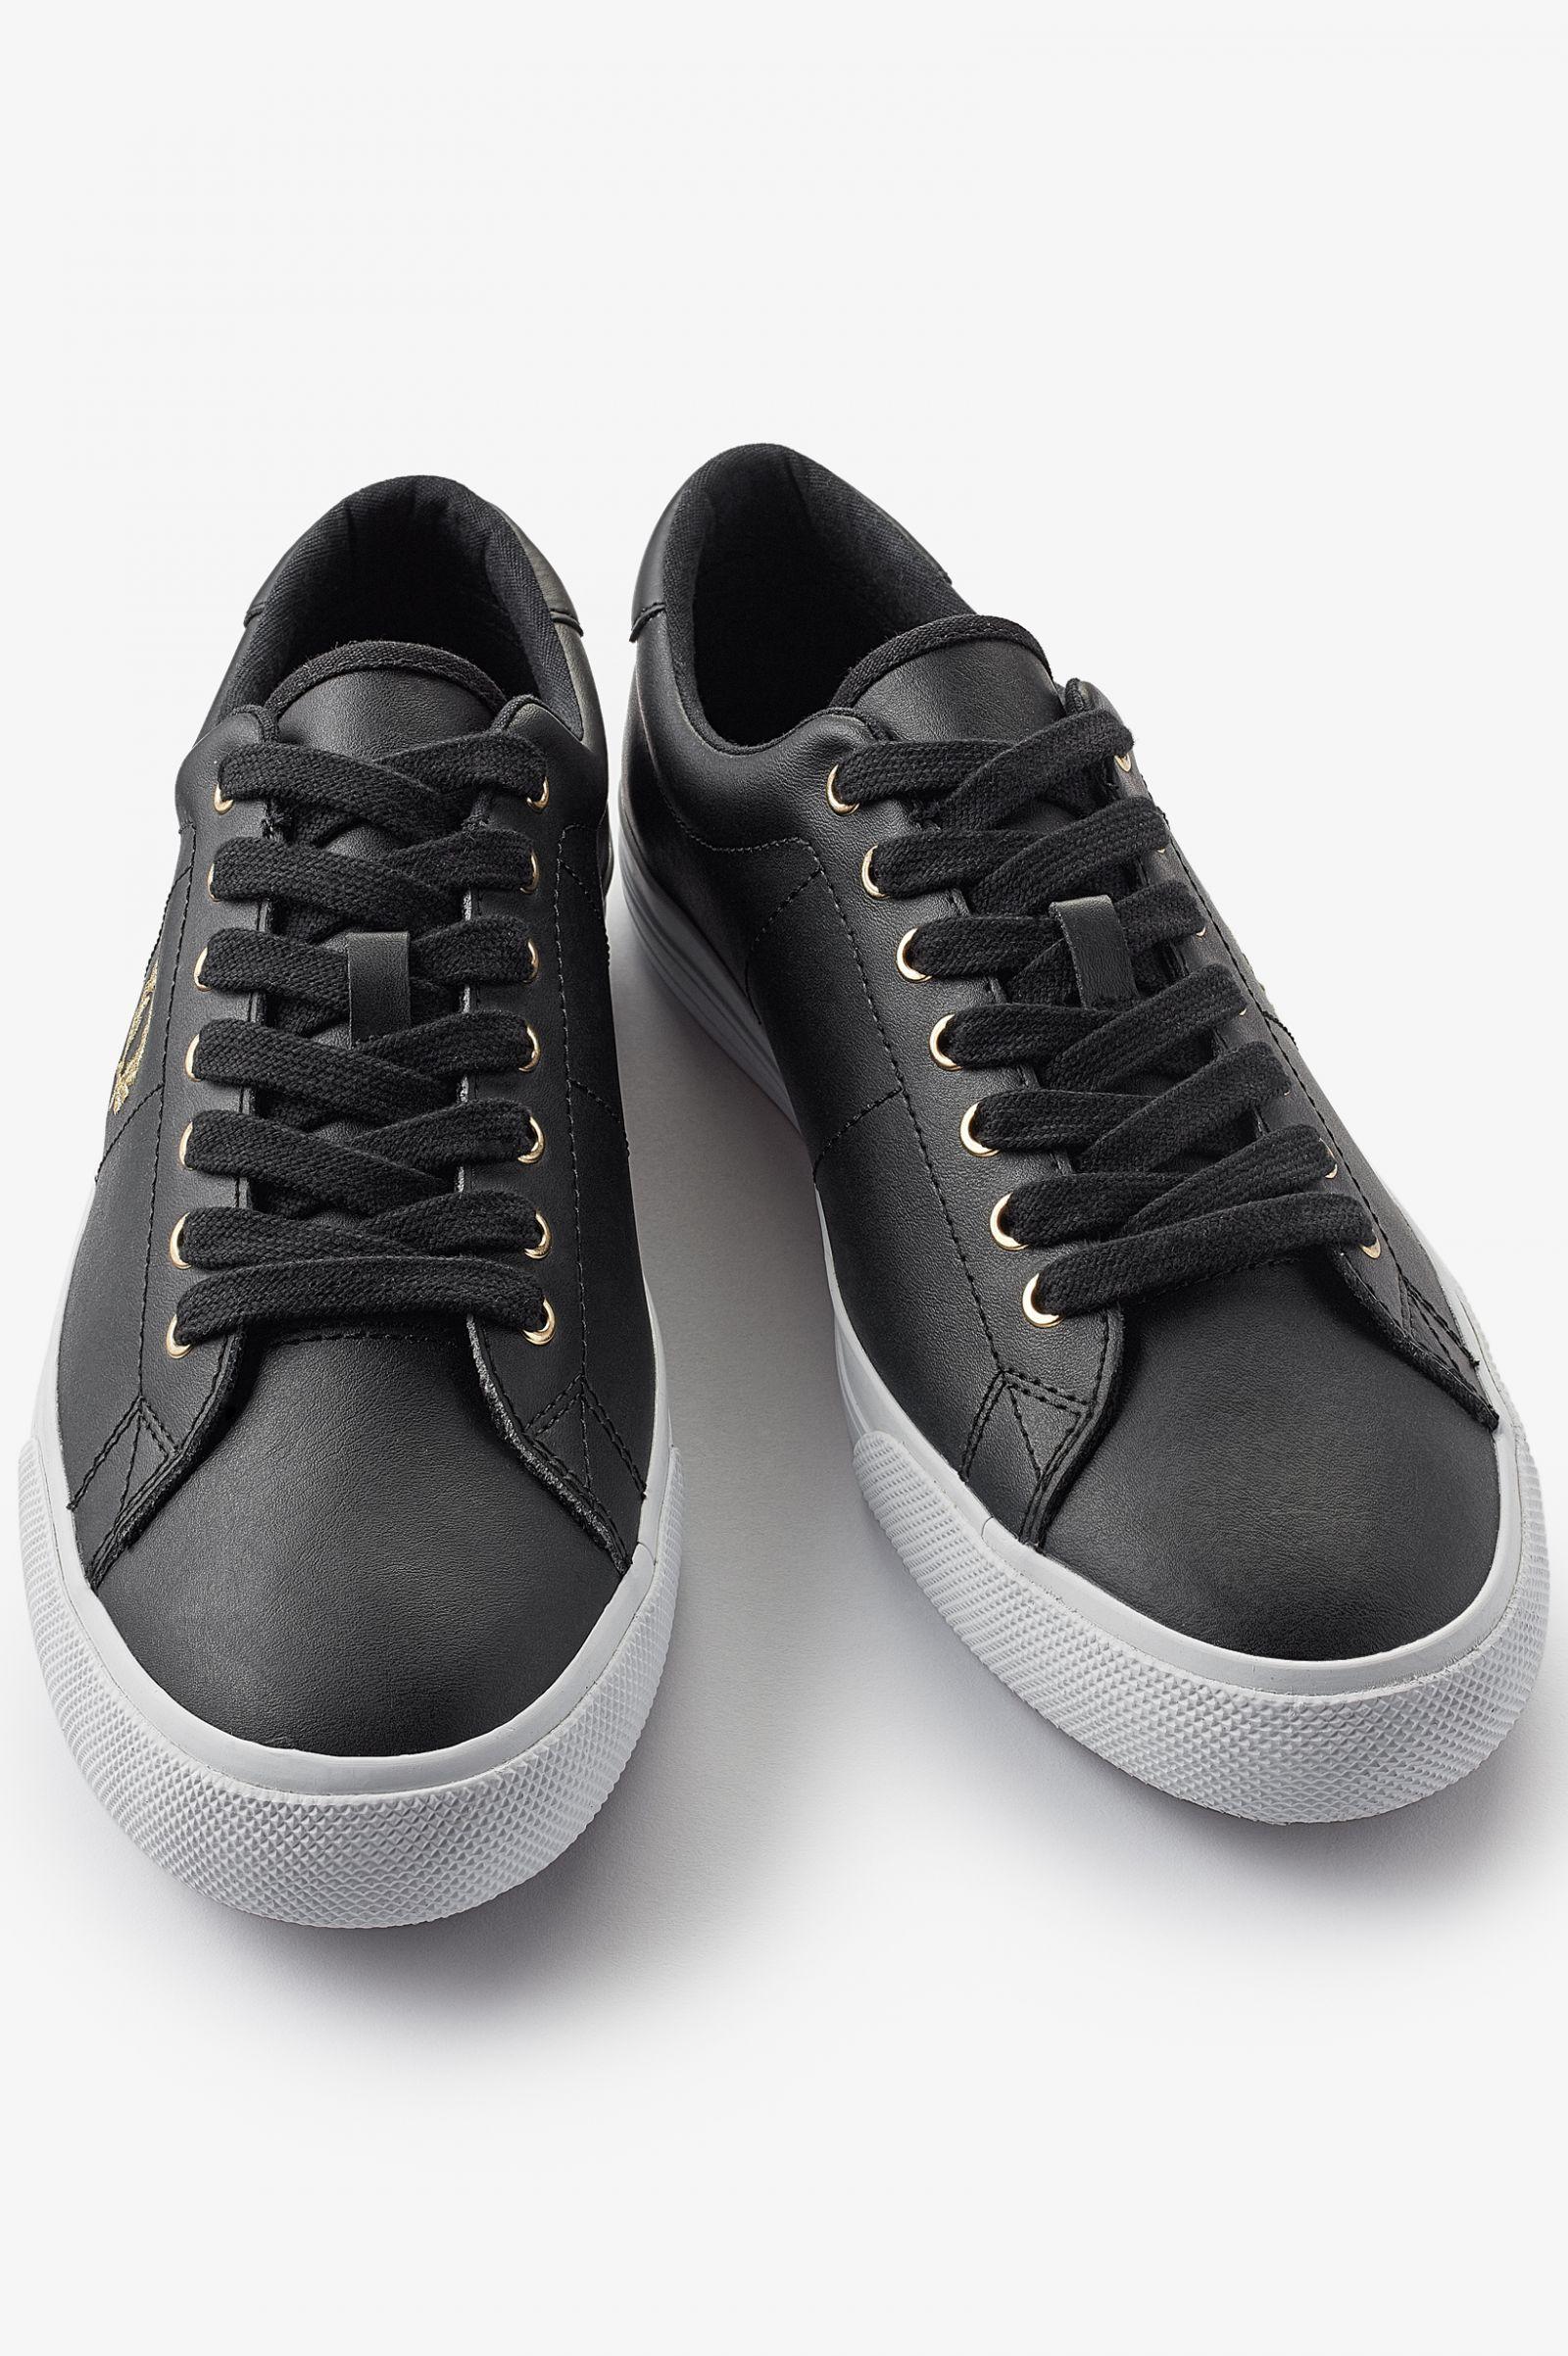 Chaussures Underspin en cuir Noir   Chaussures Pour Homme